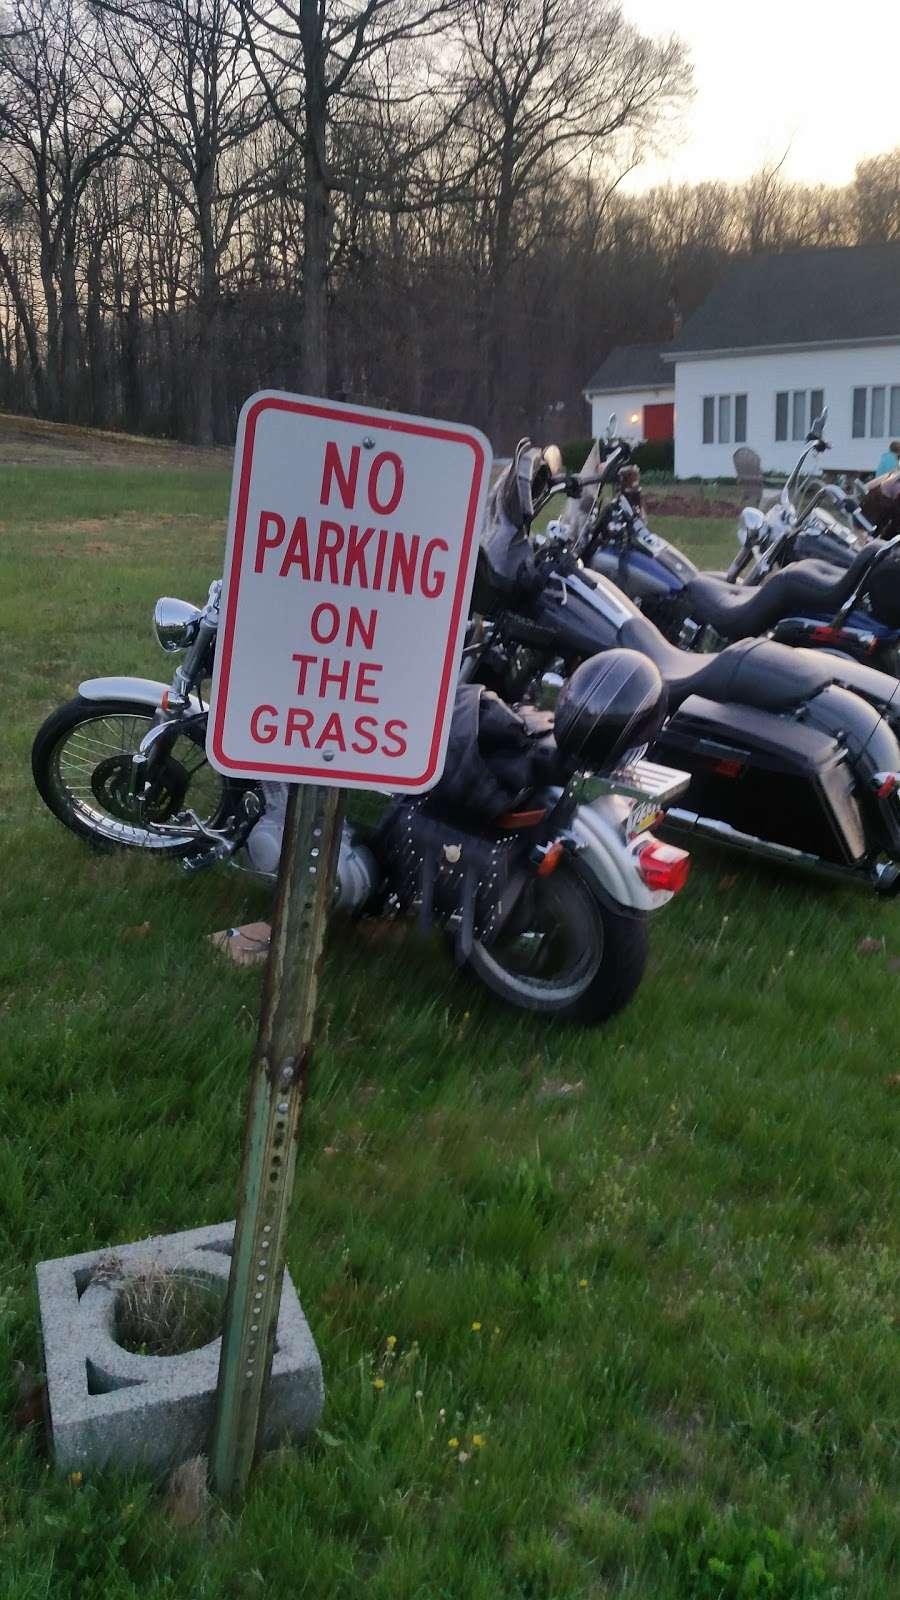 The Biker CHURCH - church  | Photo 10 of 10 | Address: 36-98 Chapel Ln, Boyertown, PA 19512, USA | Phone: (610) 367-7570